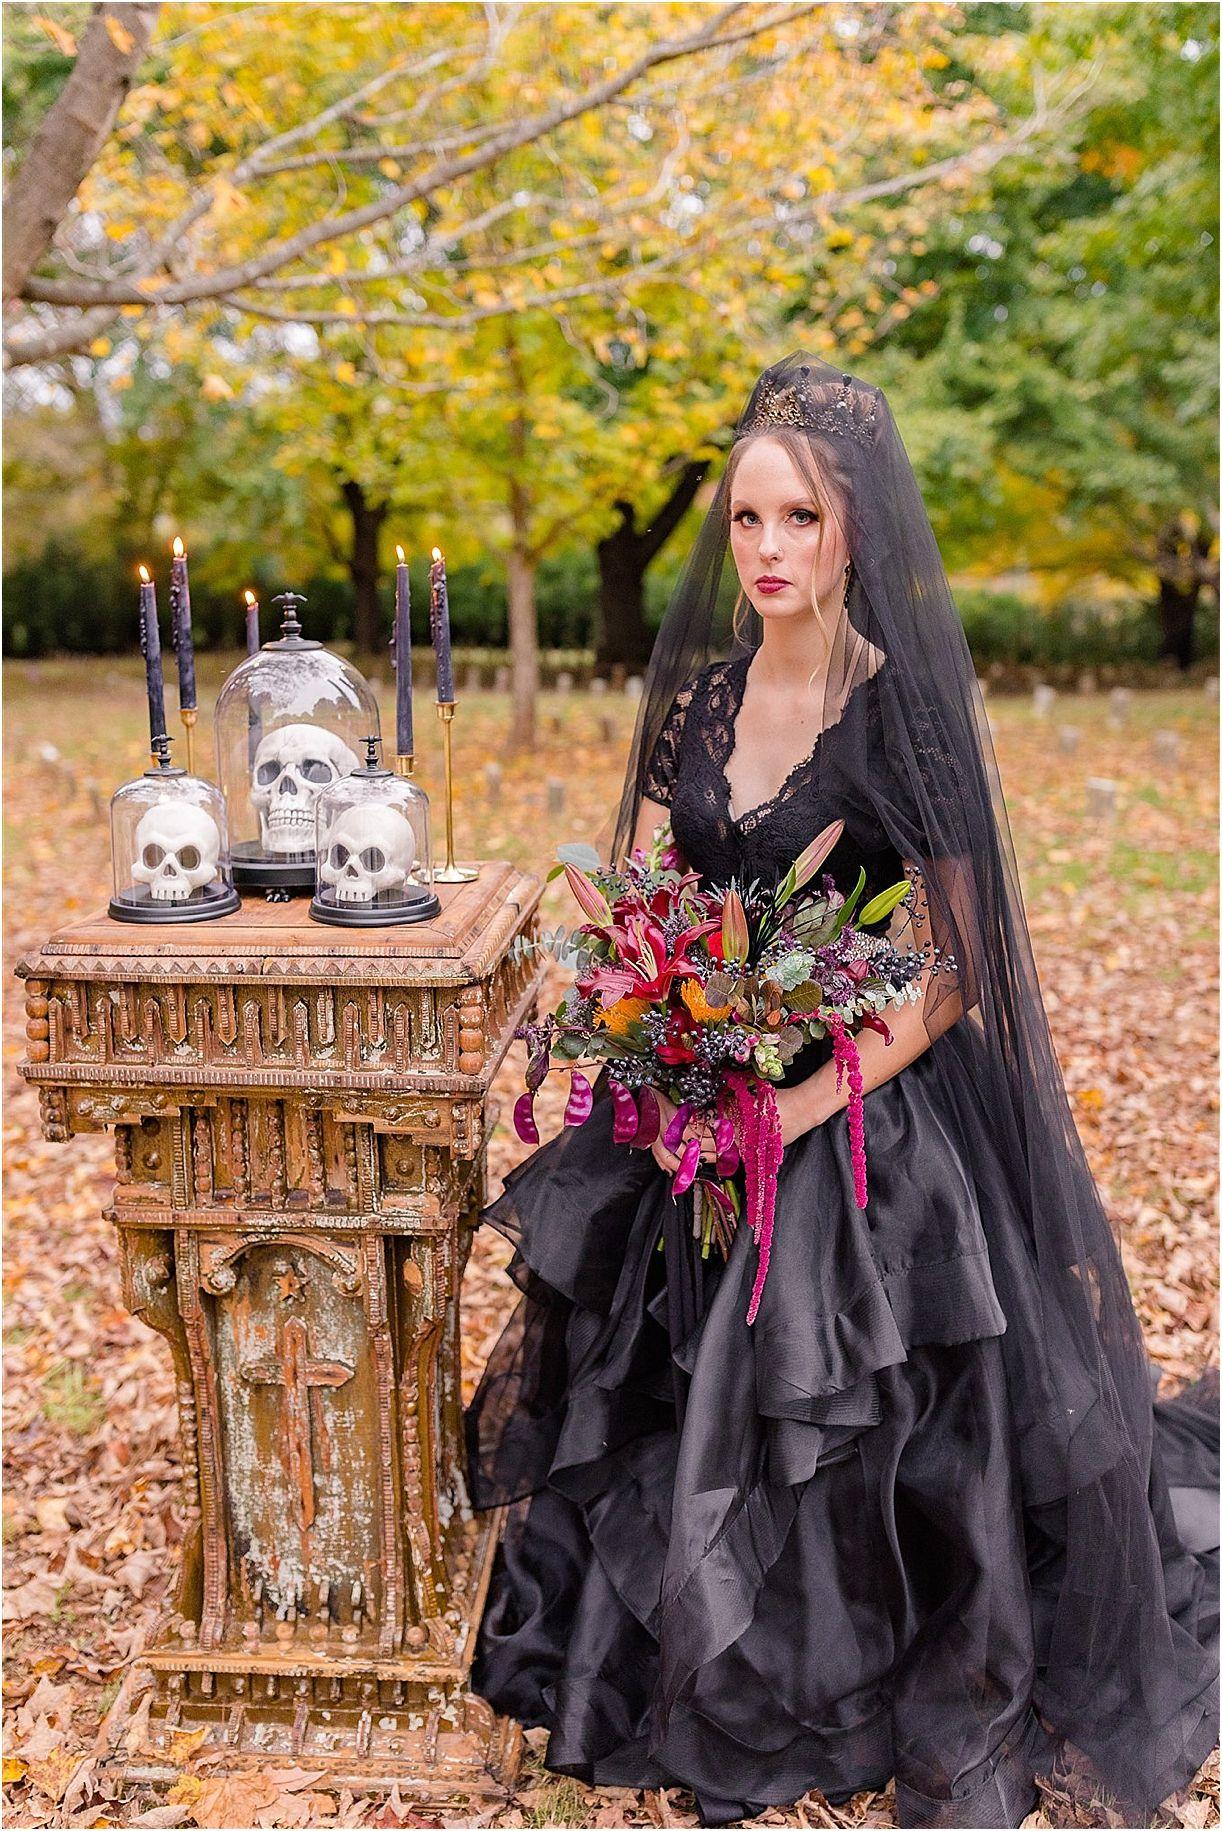 Gothic Wedding Dress Inspiration For Halloween Gothic Wedding Popular Wedding Dresses Black Wedding Dress Gothic [ 1831 x 1222 Pixel ]